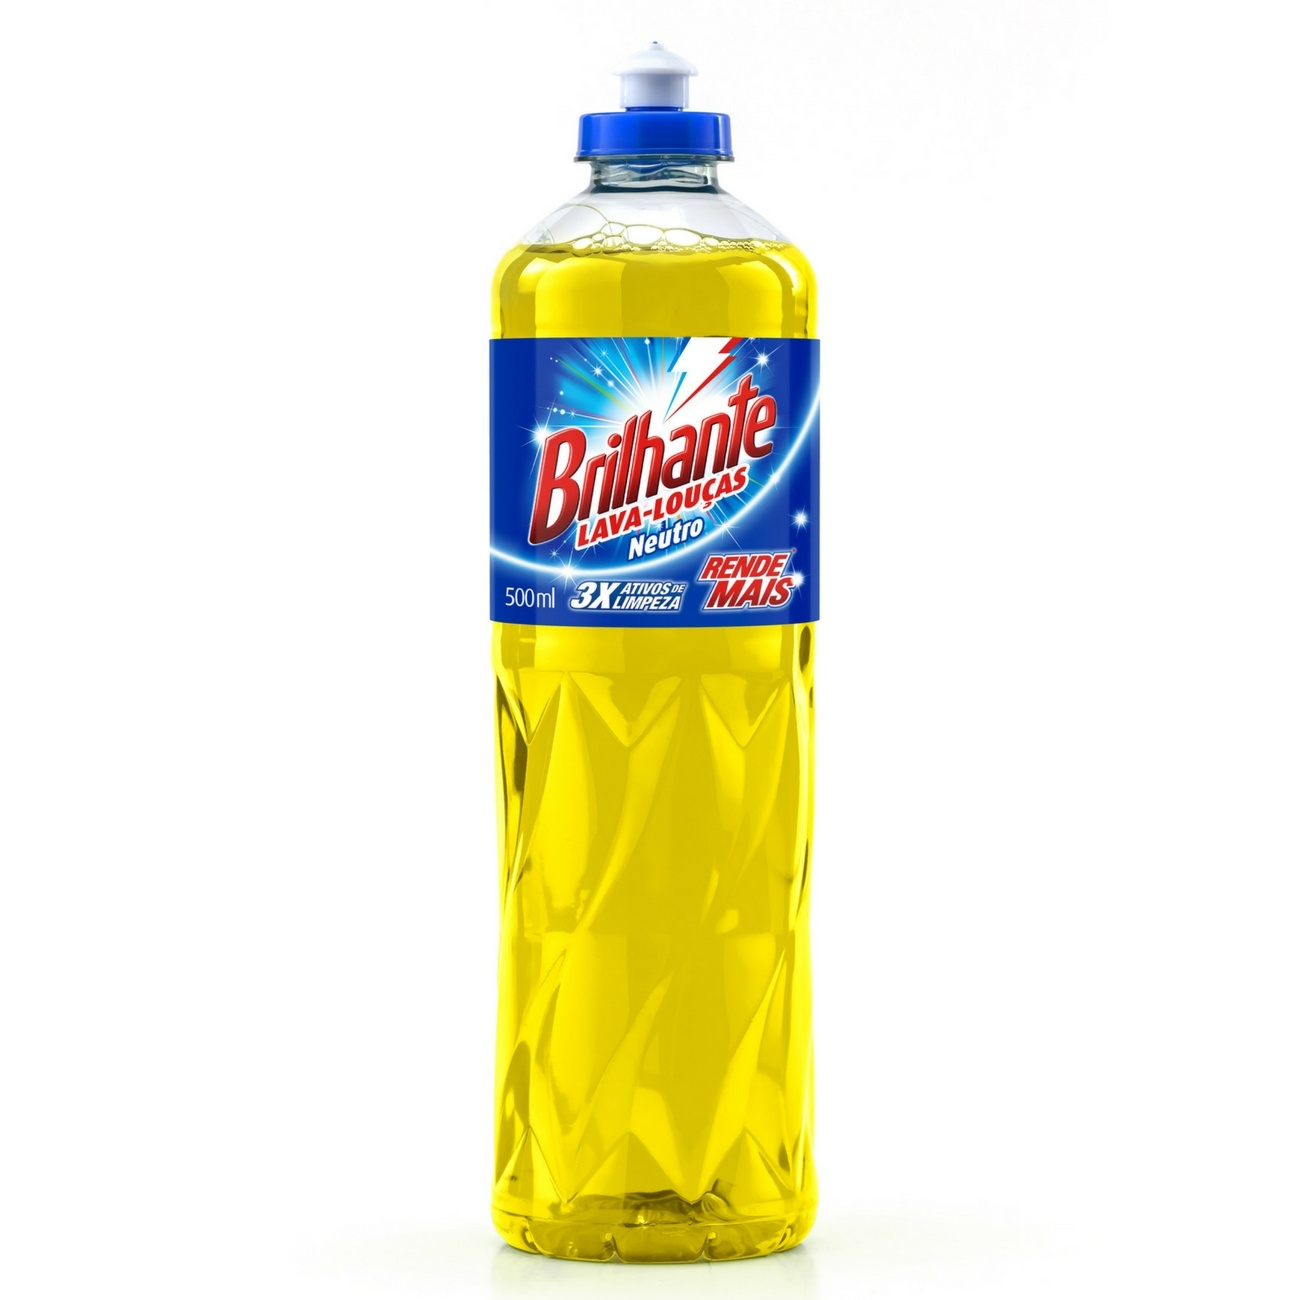 Detergente Lava Lou�as Brilhante Neutro 500ml